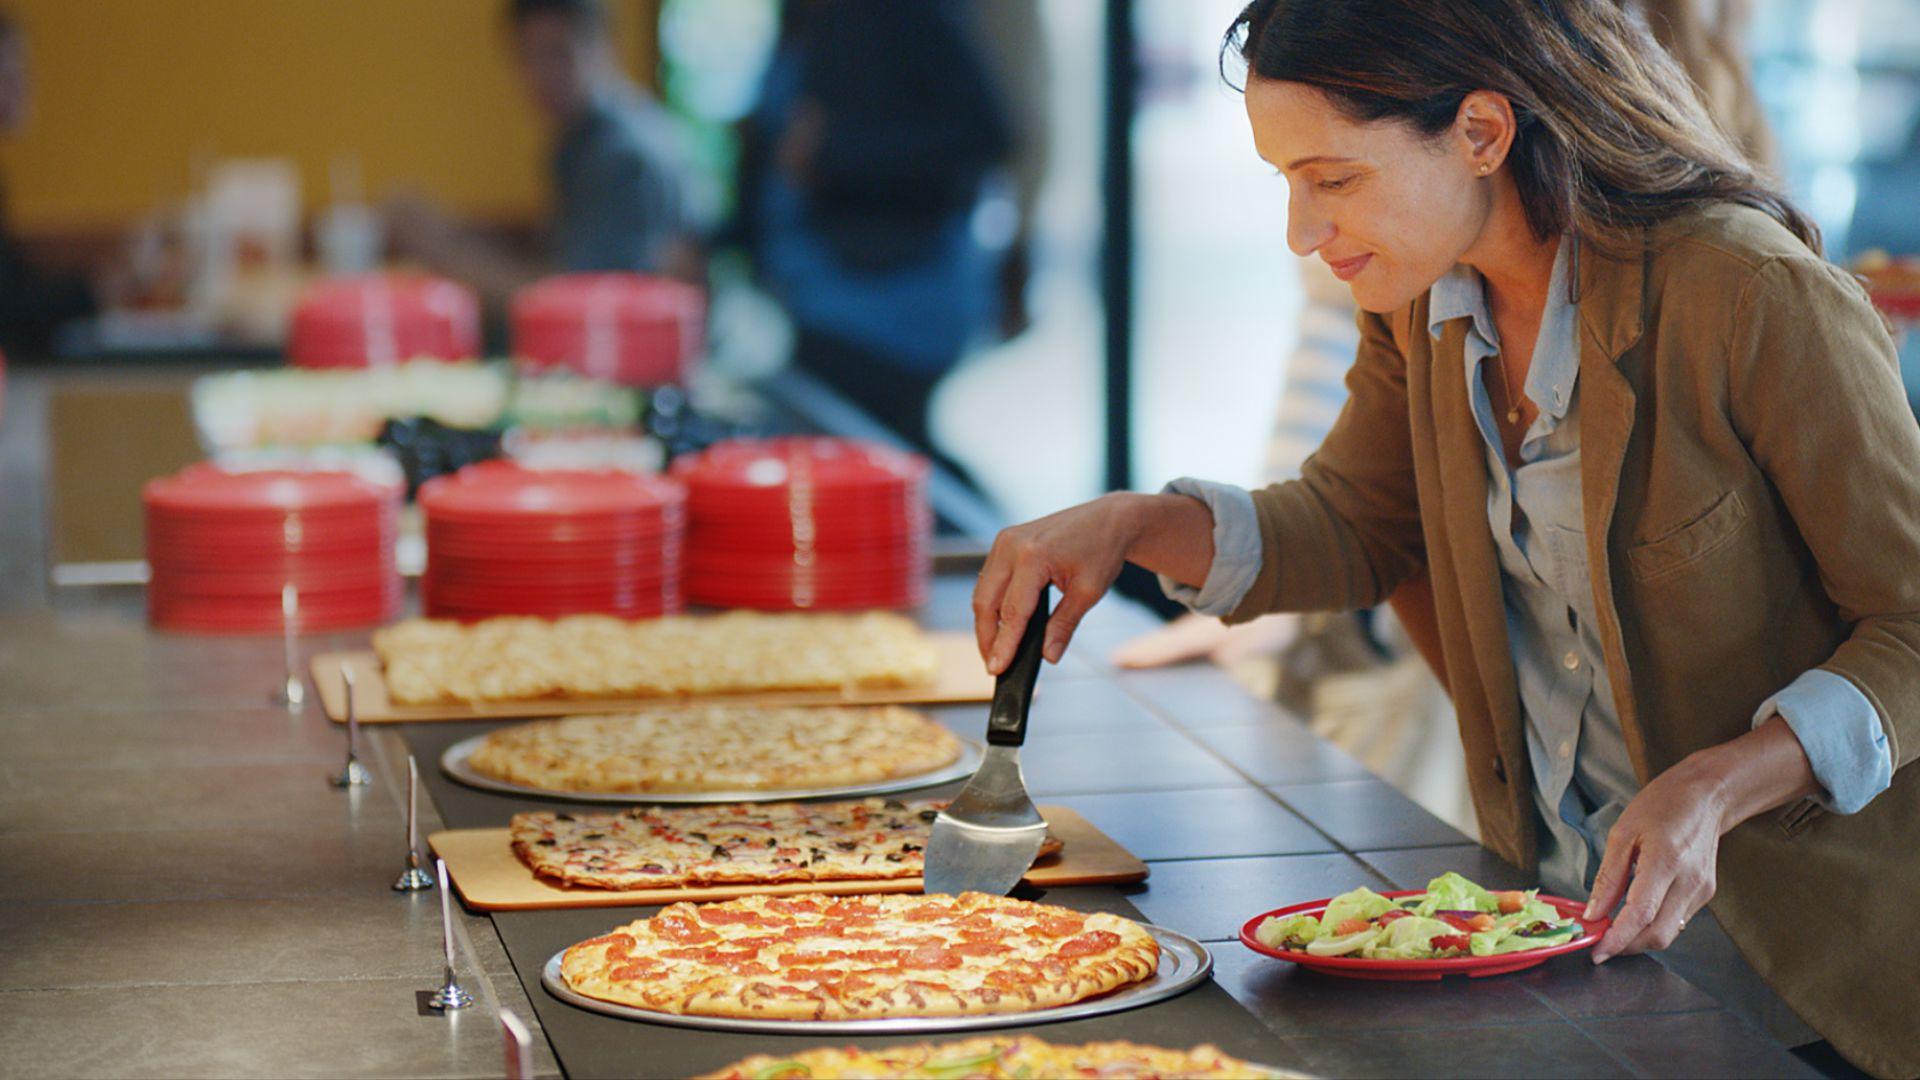 CiCi's Pizza     Franchise Case Study